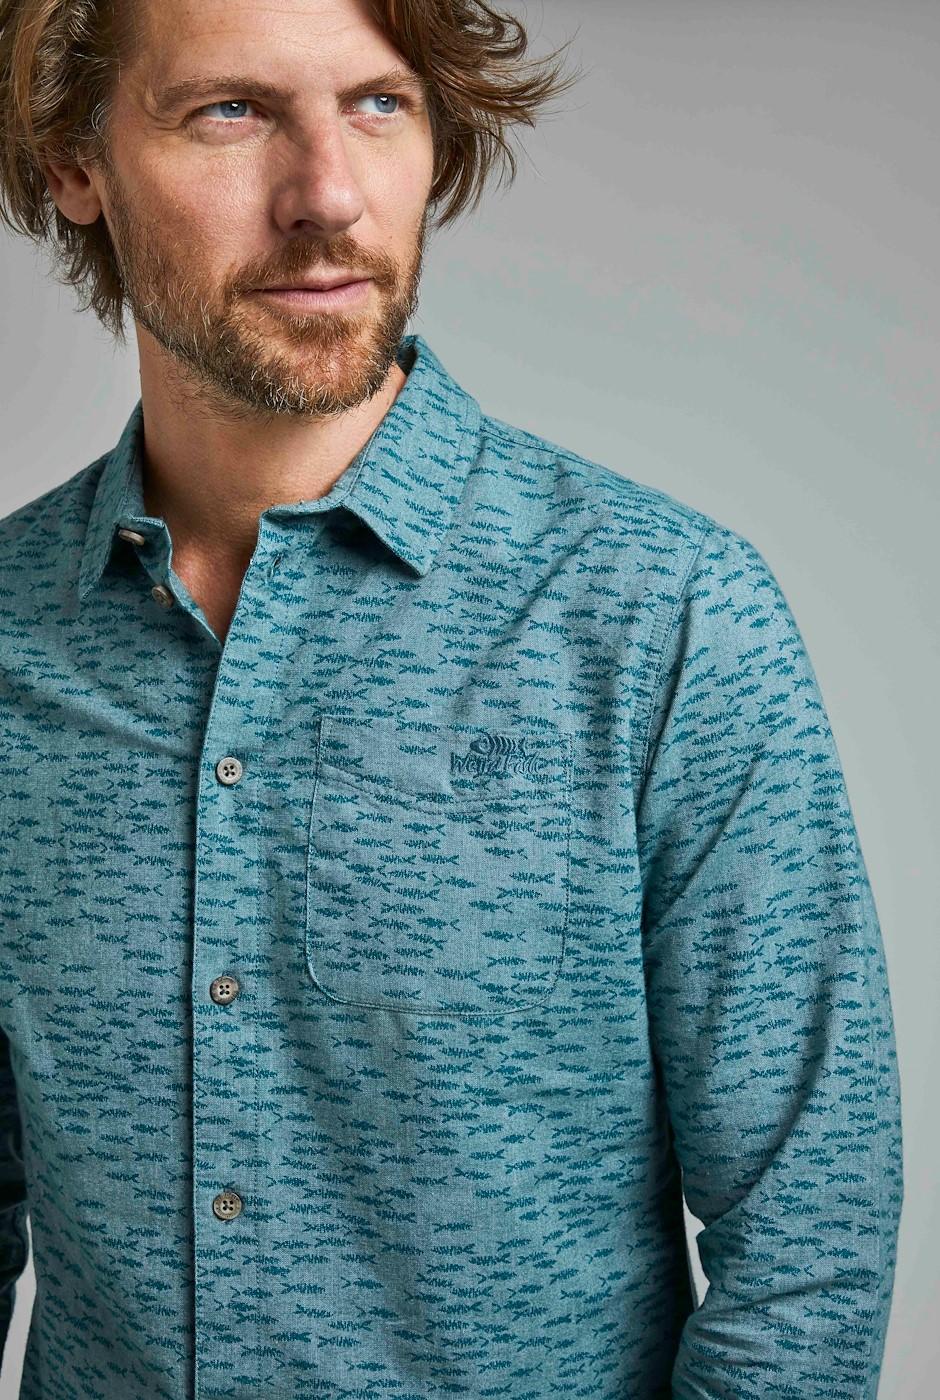 Depp Long Sleeve Printed Shirt Petrol Blue